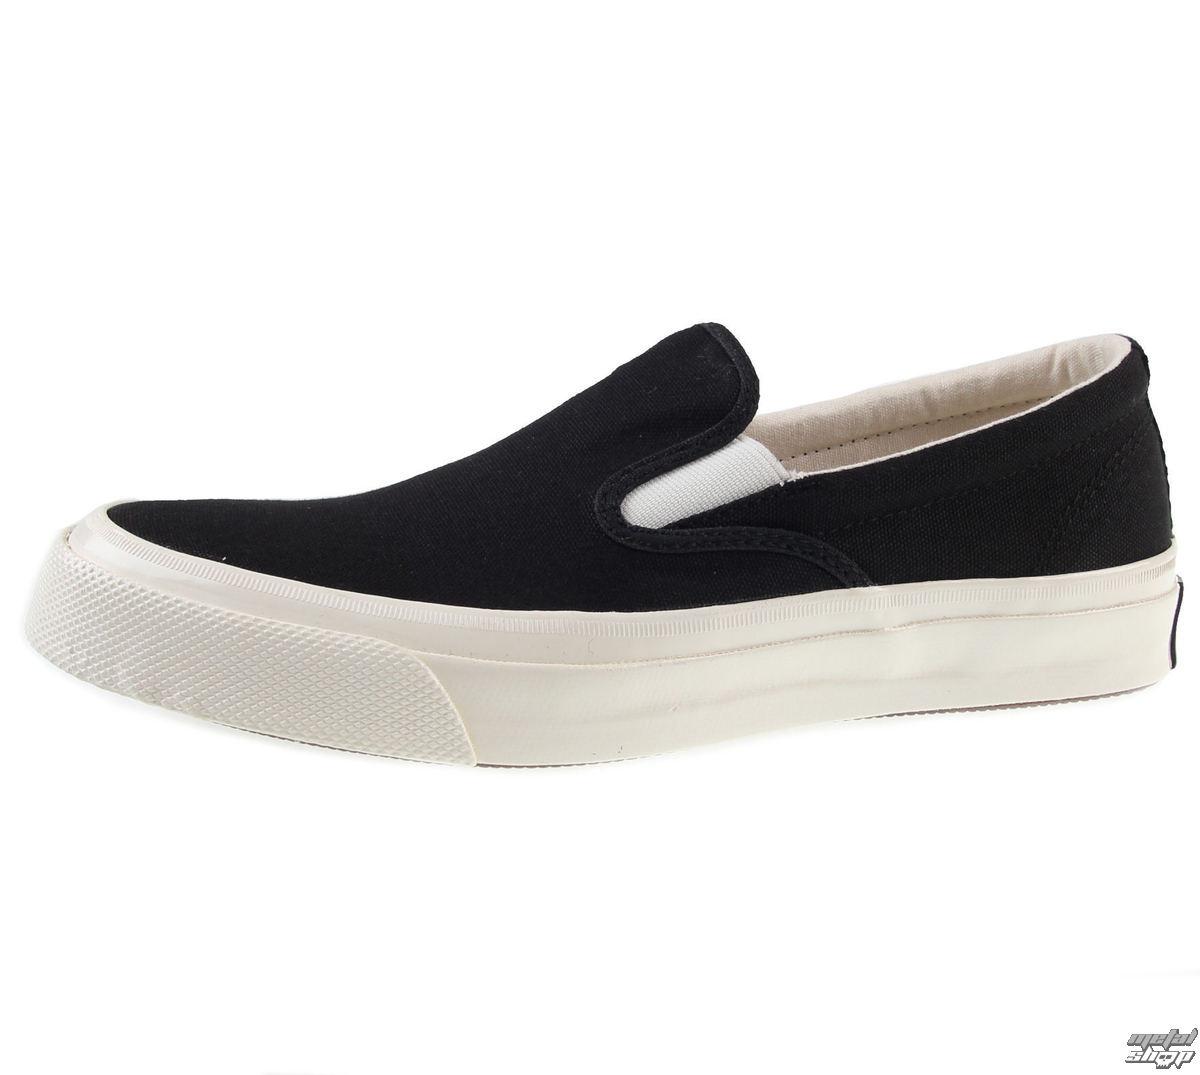 boty pánské CONVERSE - Slip On - Deck Star ´70 - Black/White - C150855